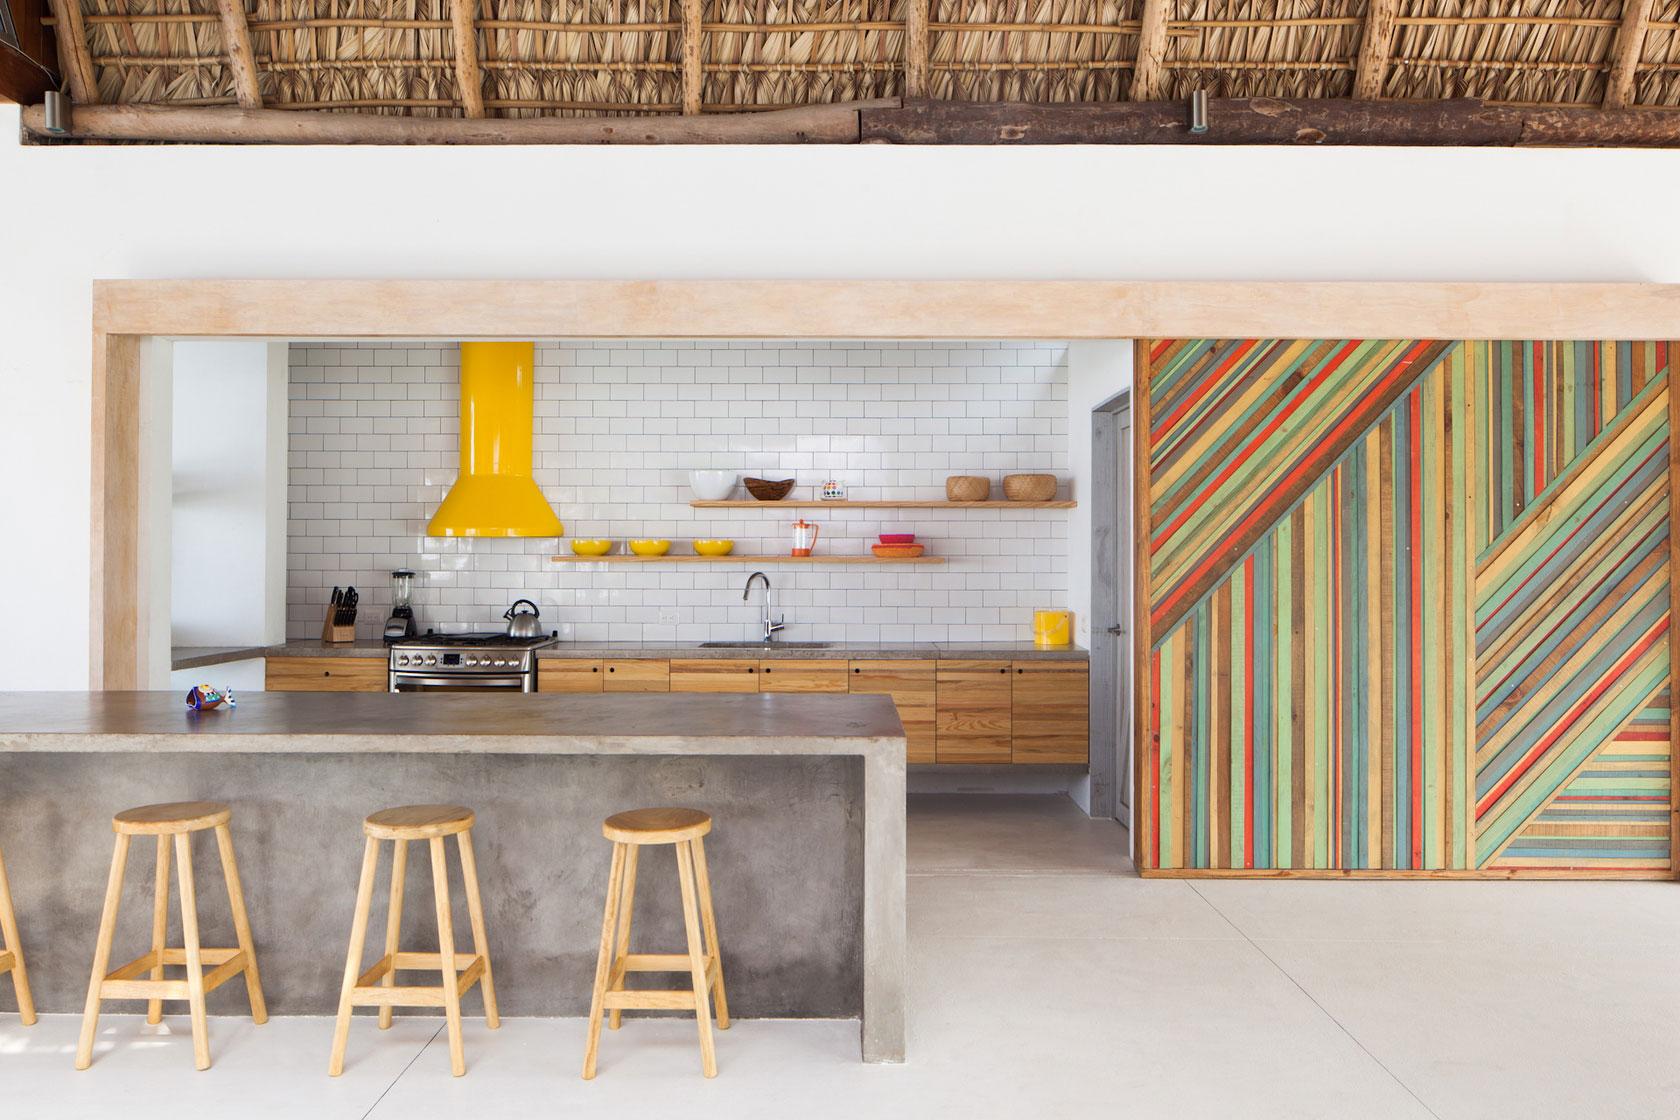 Kitchen, Breakfast Bar, Colorful Wall, Beach House in San Salvador, El Salvador